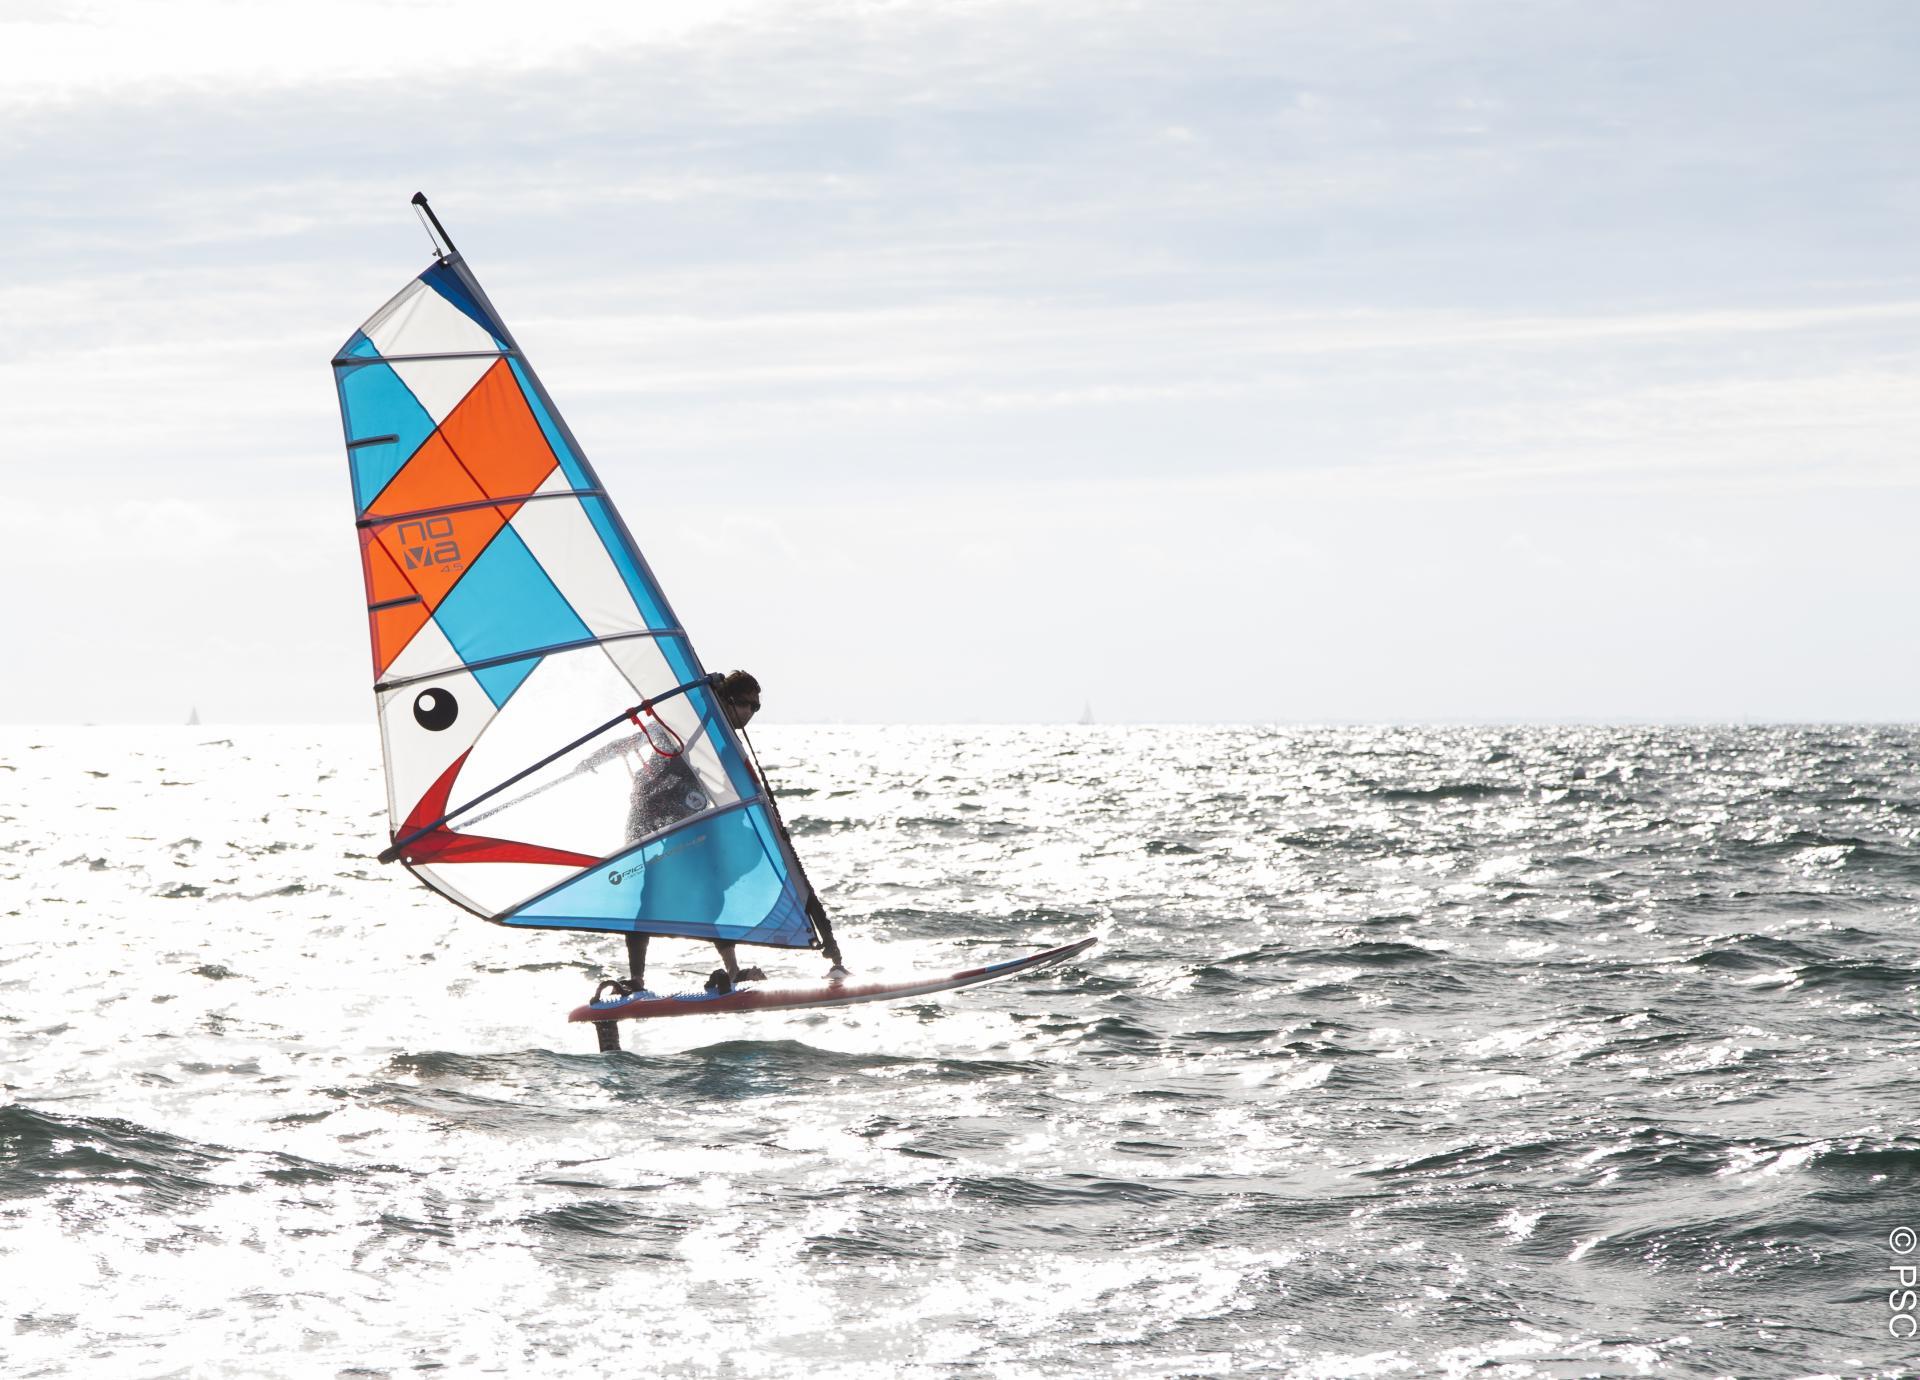 Club Nautique du Rohu  windsurf with foil